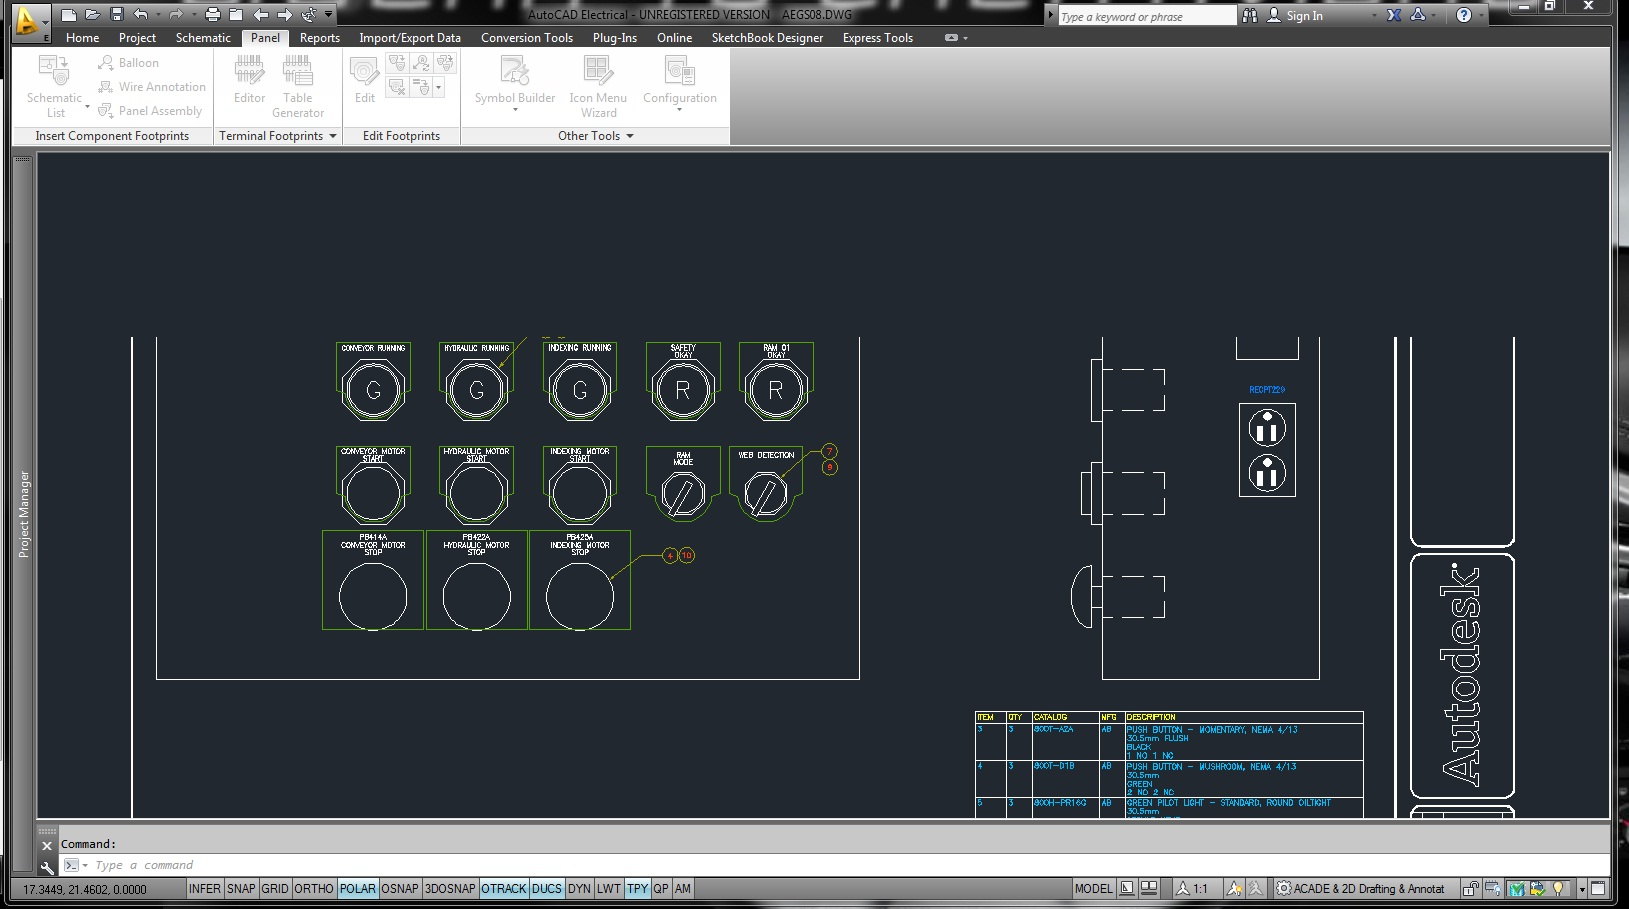 AutoCAD Electrical 2013